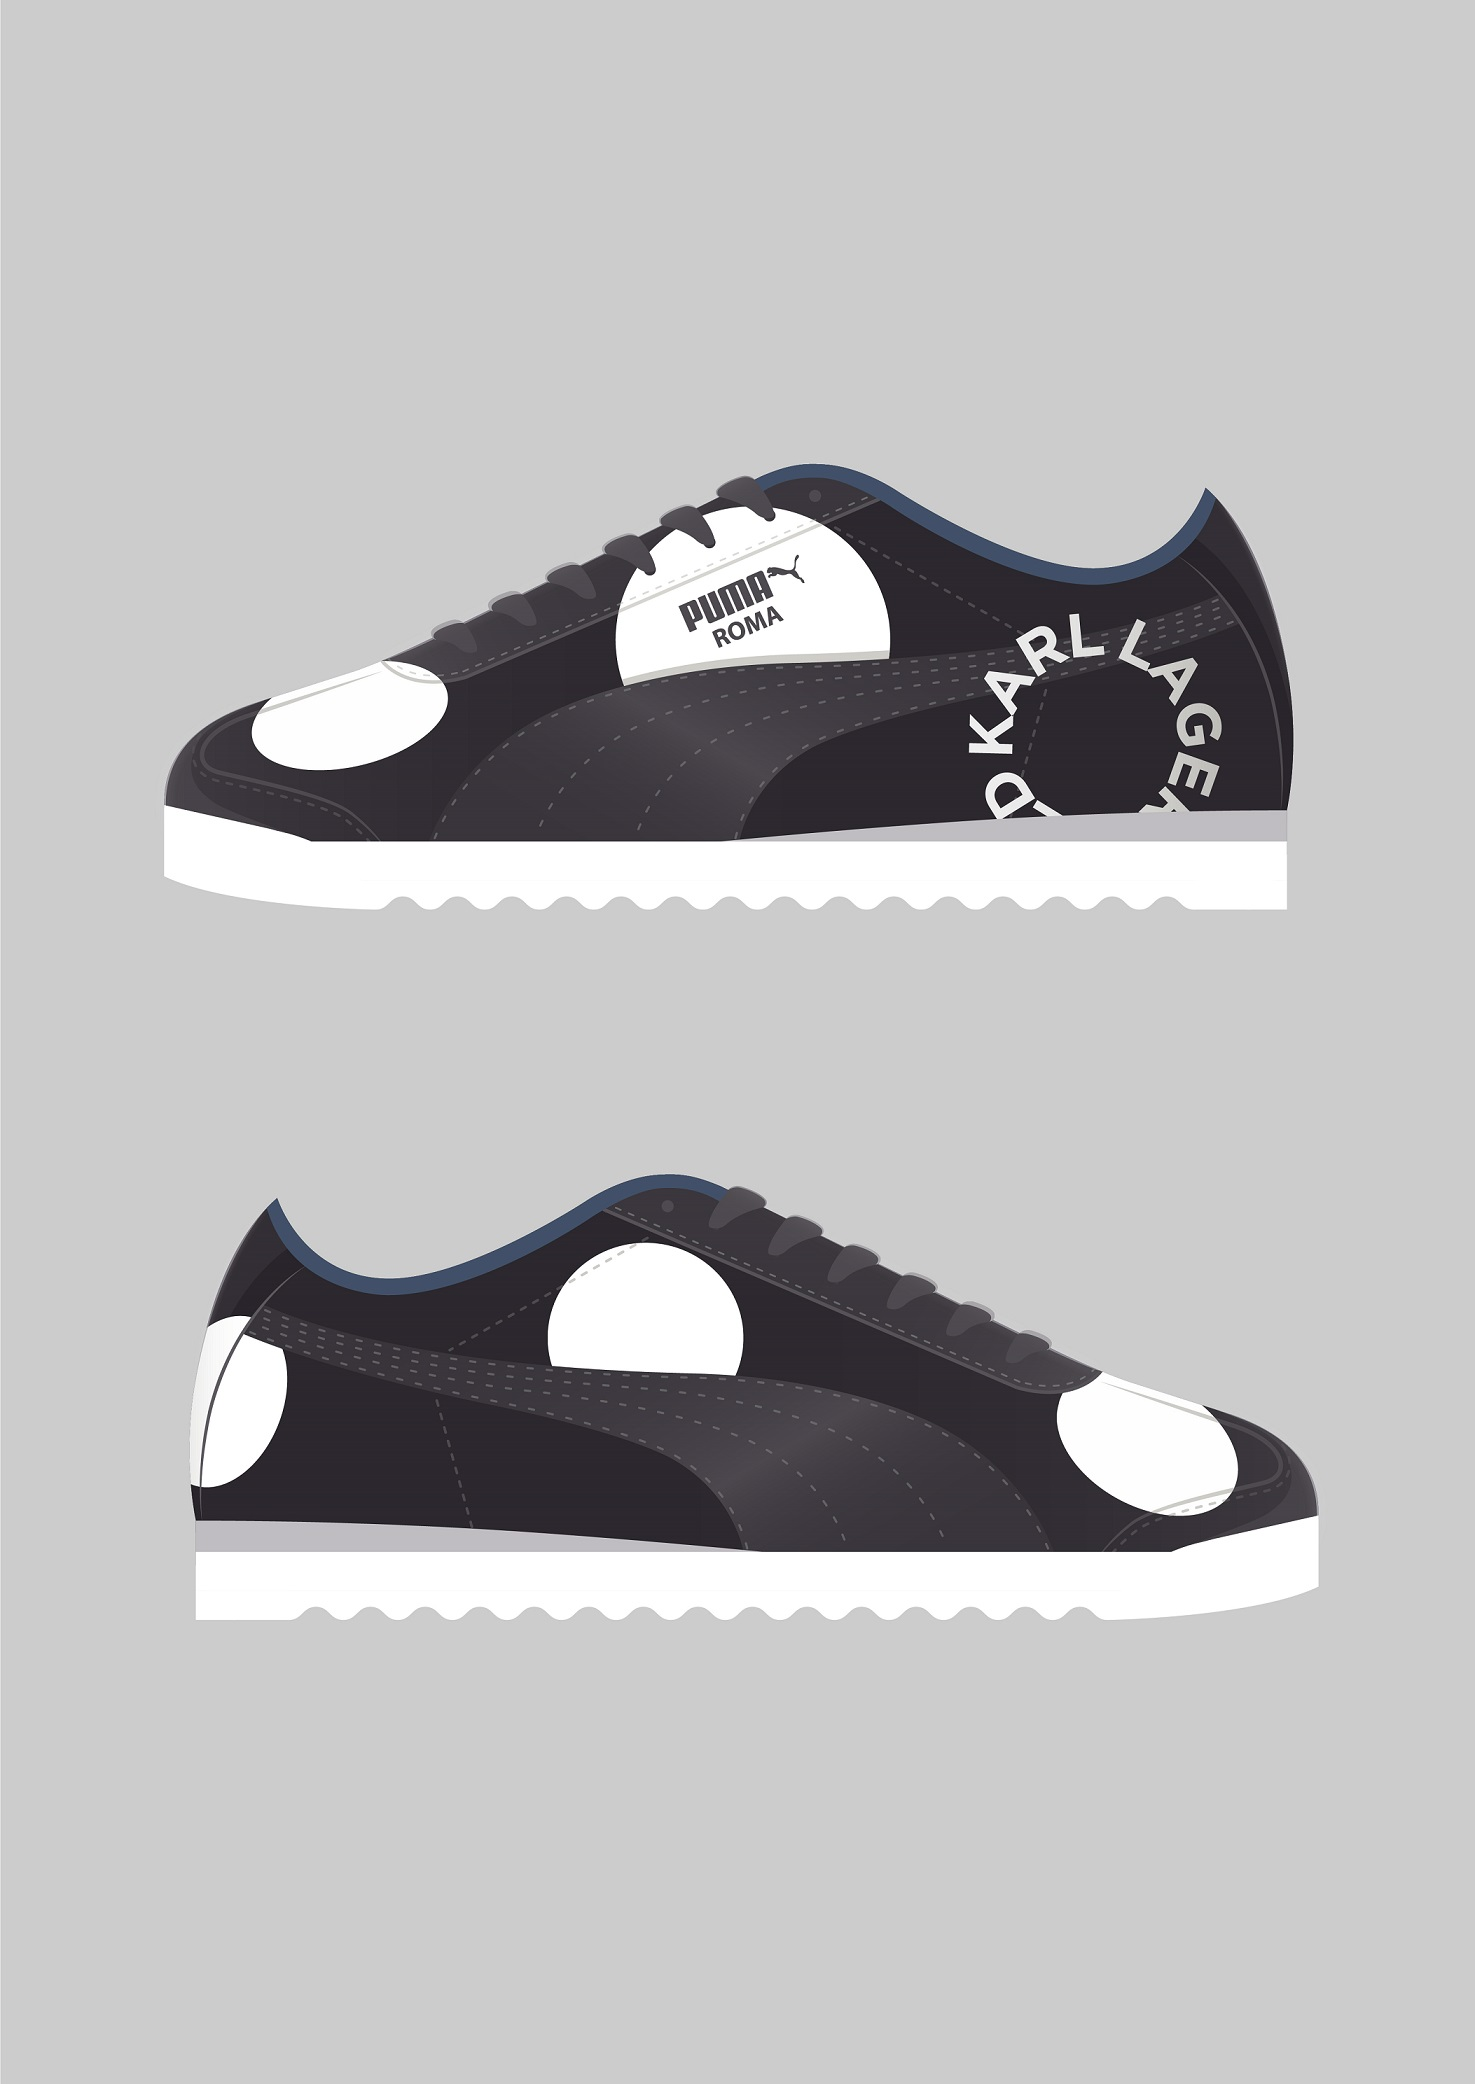 Designer sneakers: When high street takes on streetwear